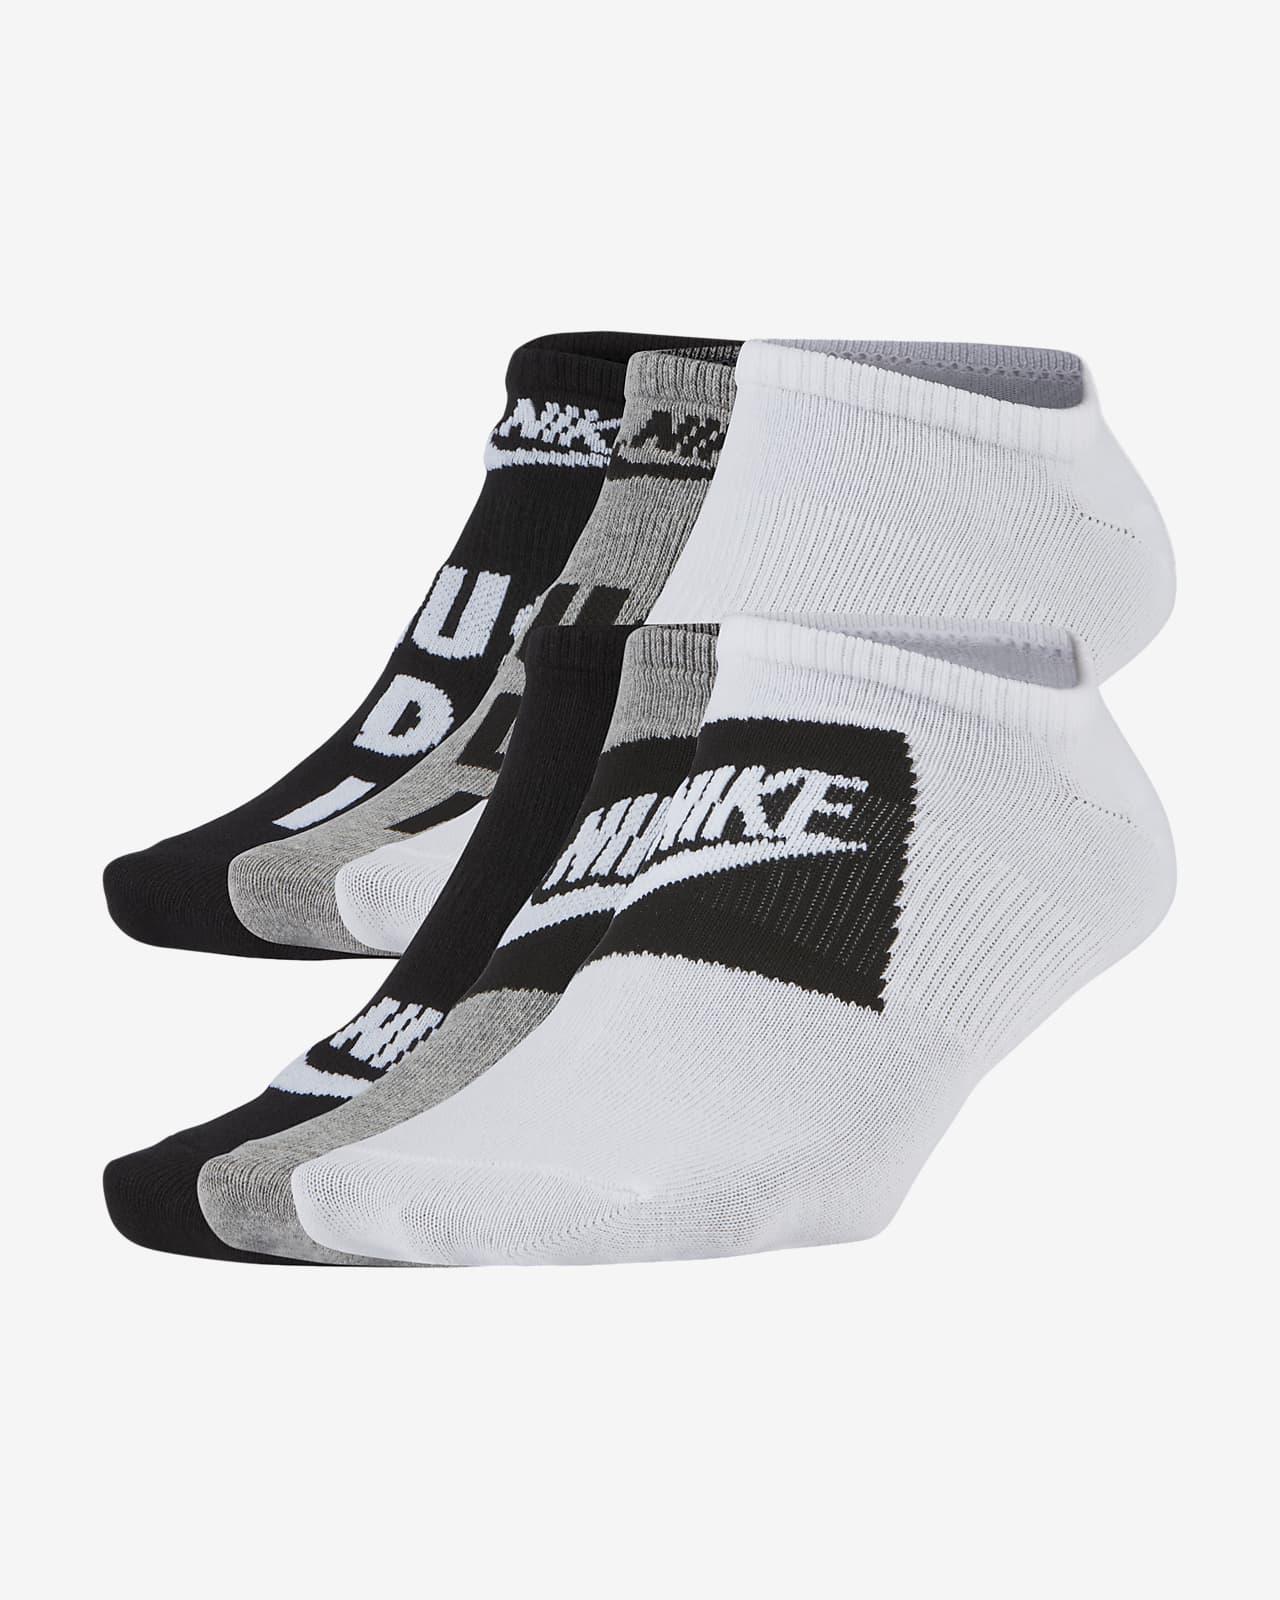 Nike Everyday Kids' Lightweight No-Show Socks (6 Pairs)